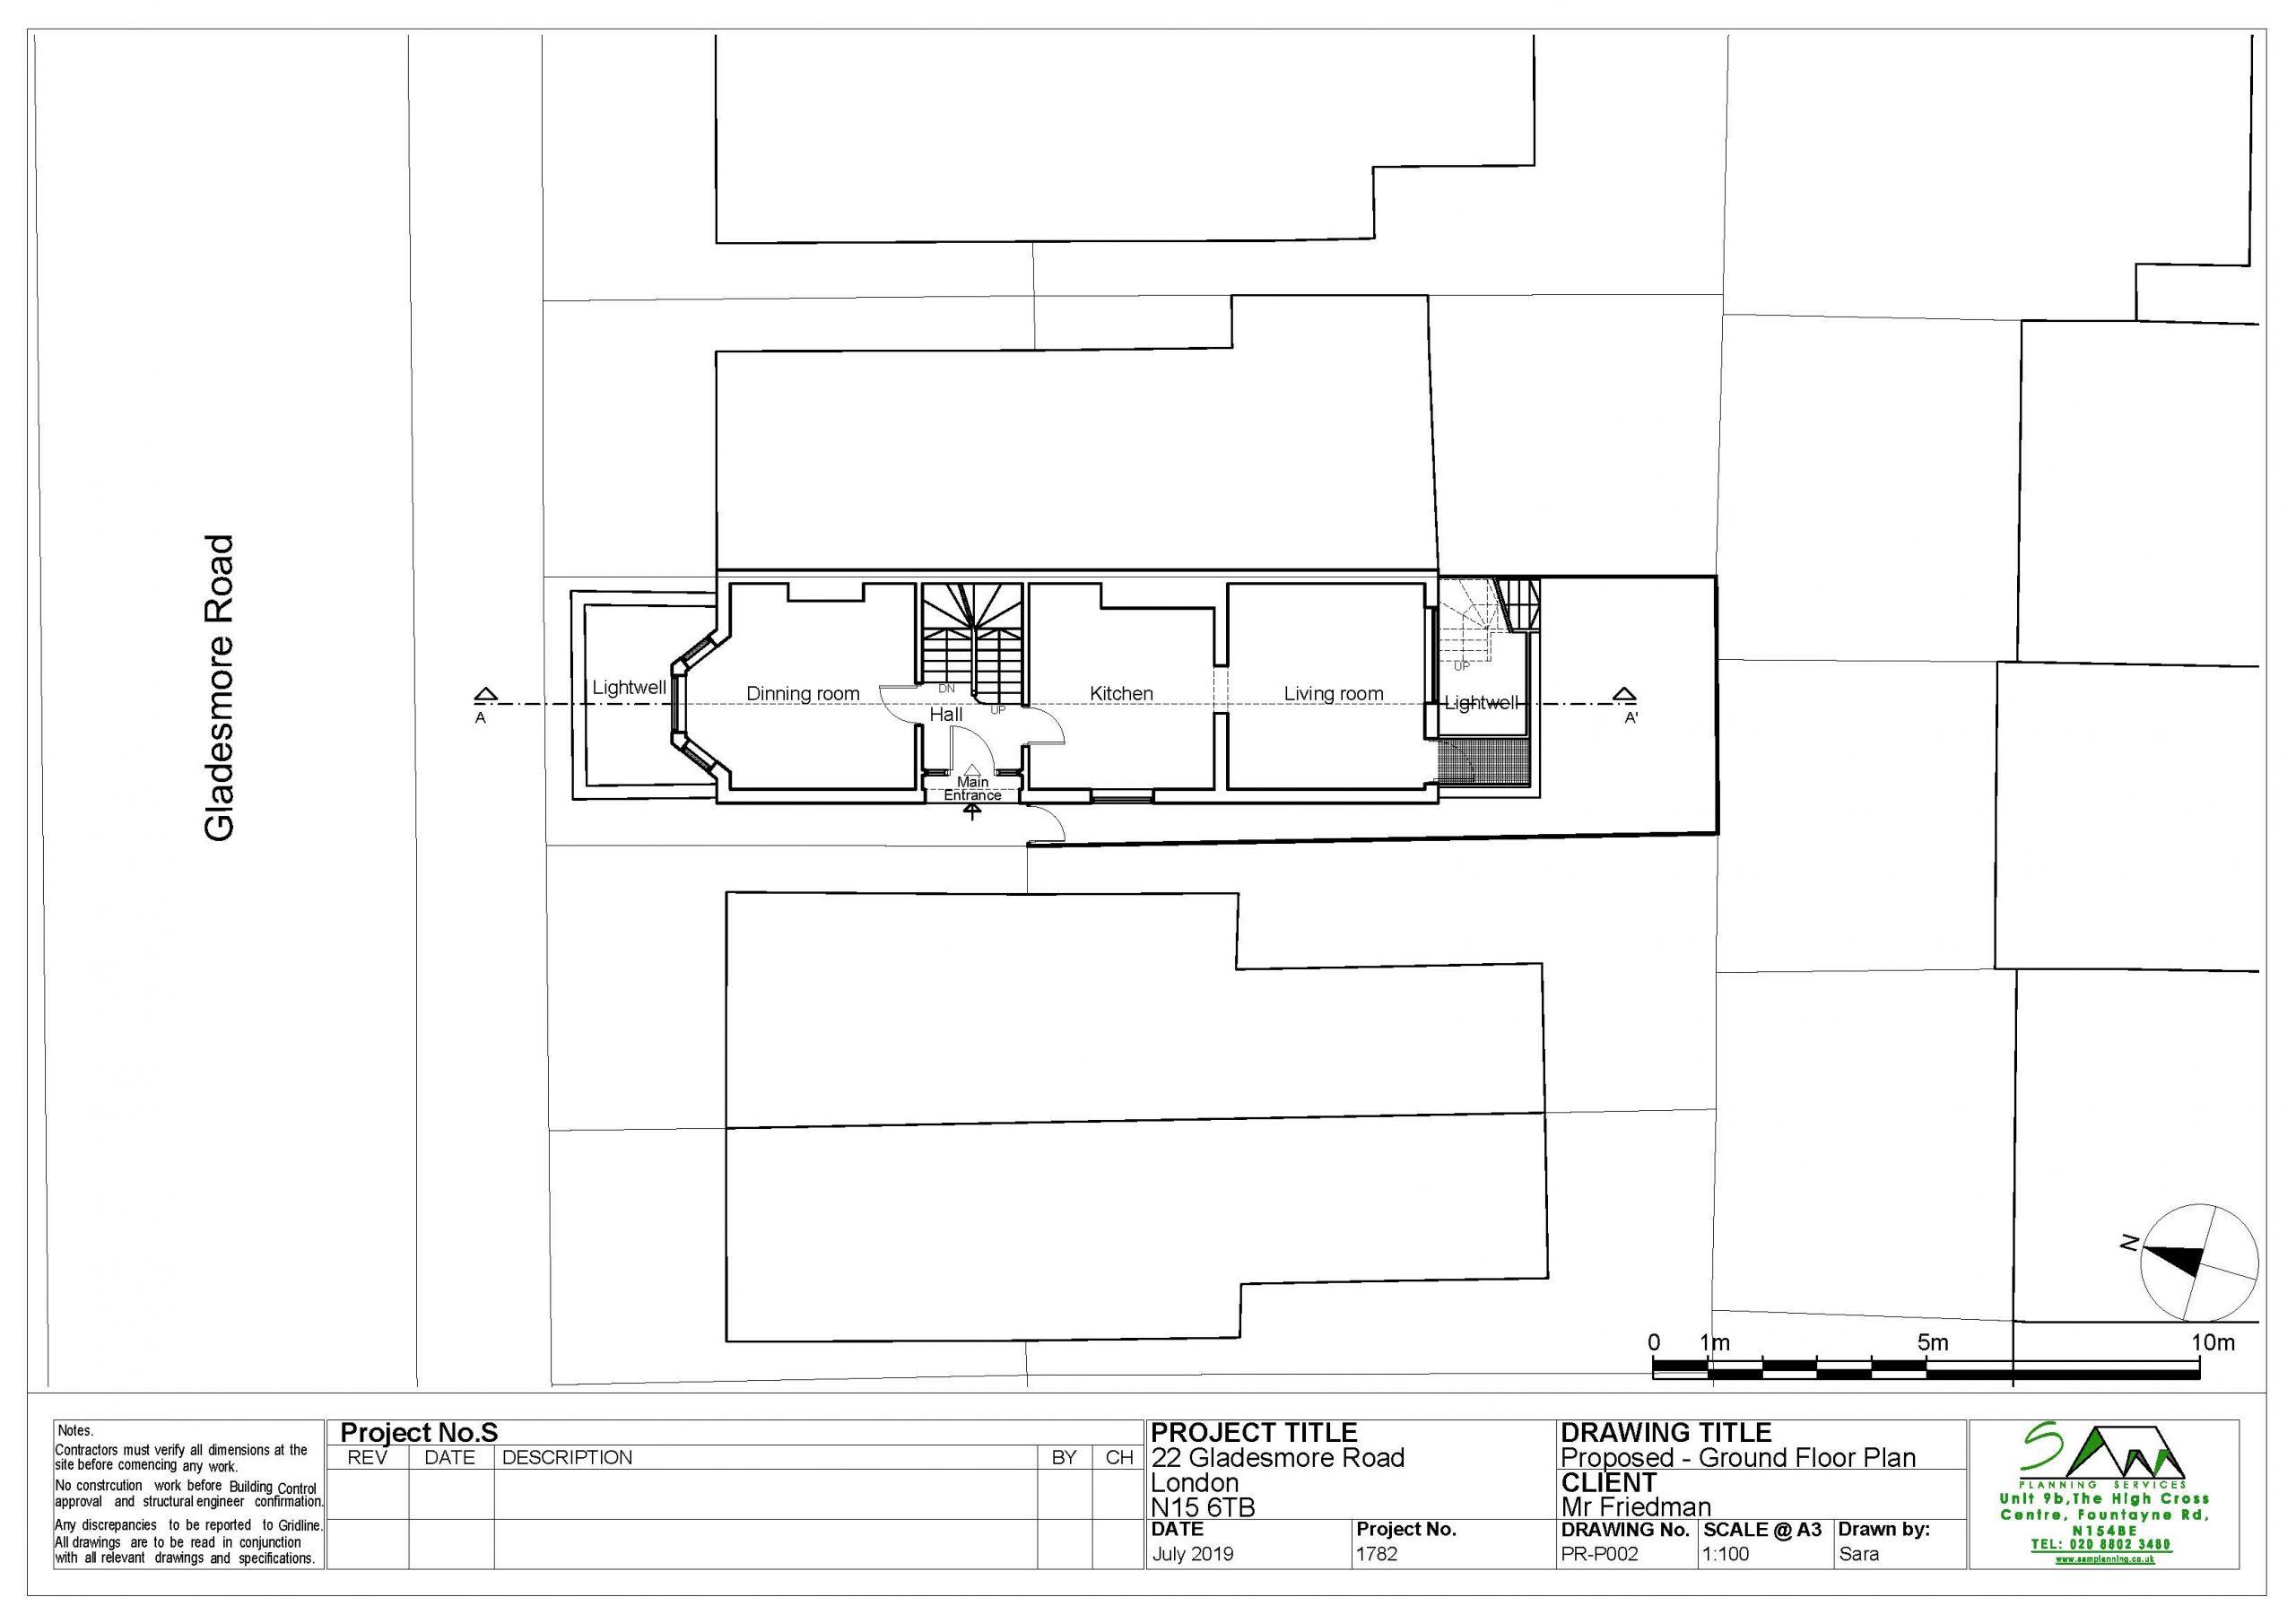 22gladesmoreProposed Ground Floor Plan